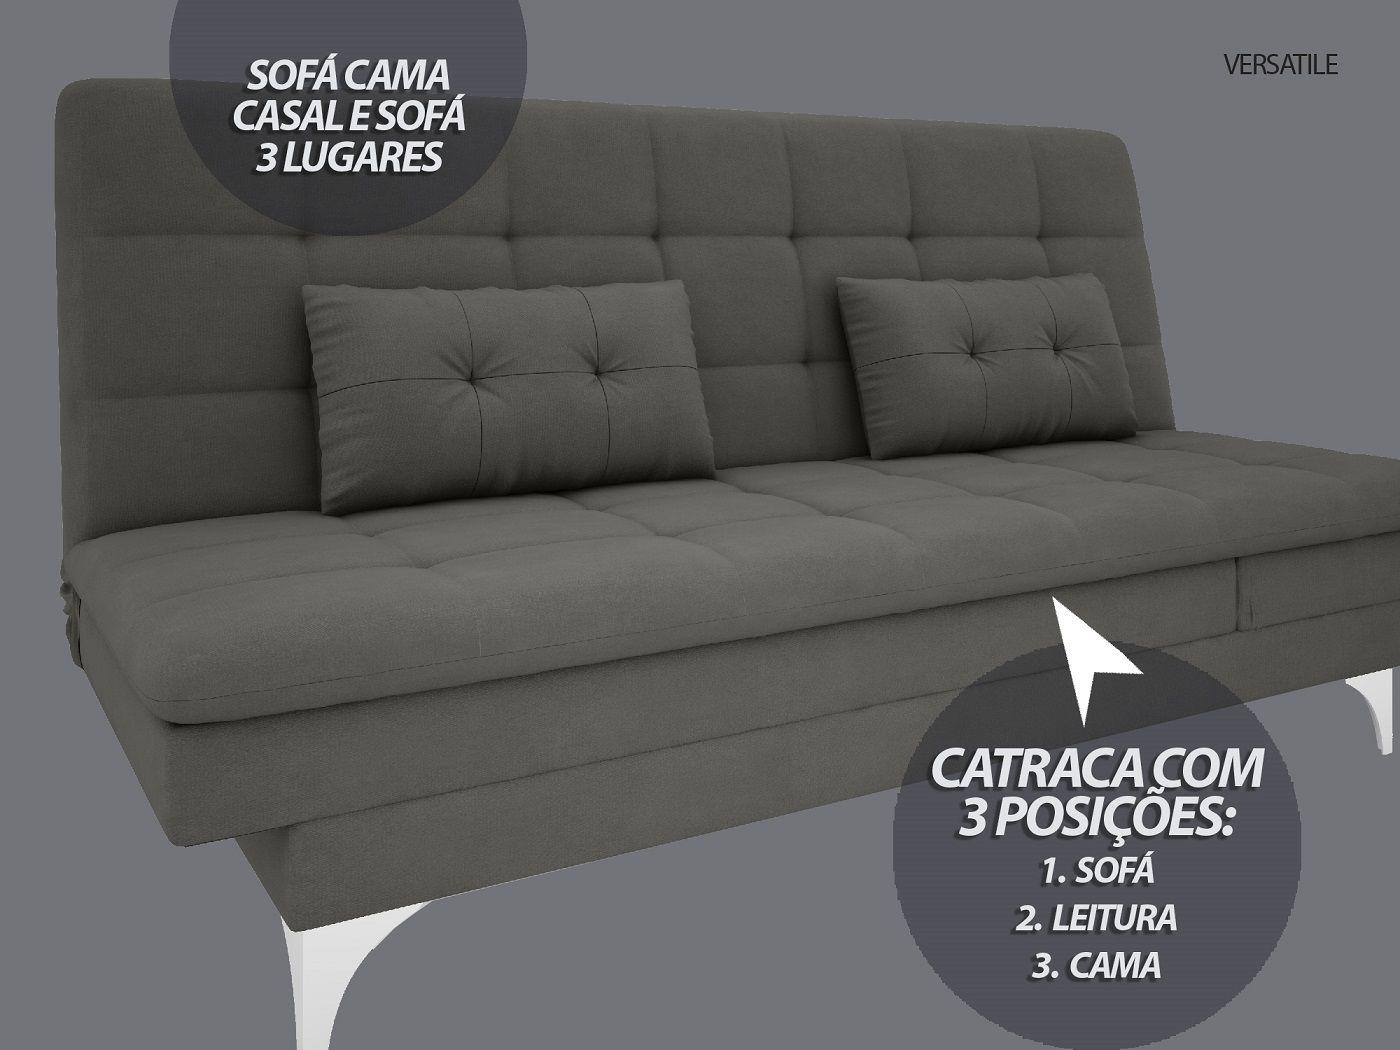 Sofá-Cama Casal New Versatile 1,94m Velosuede Cinza - NETSOFAS